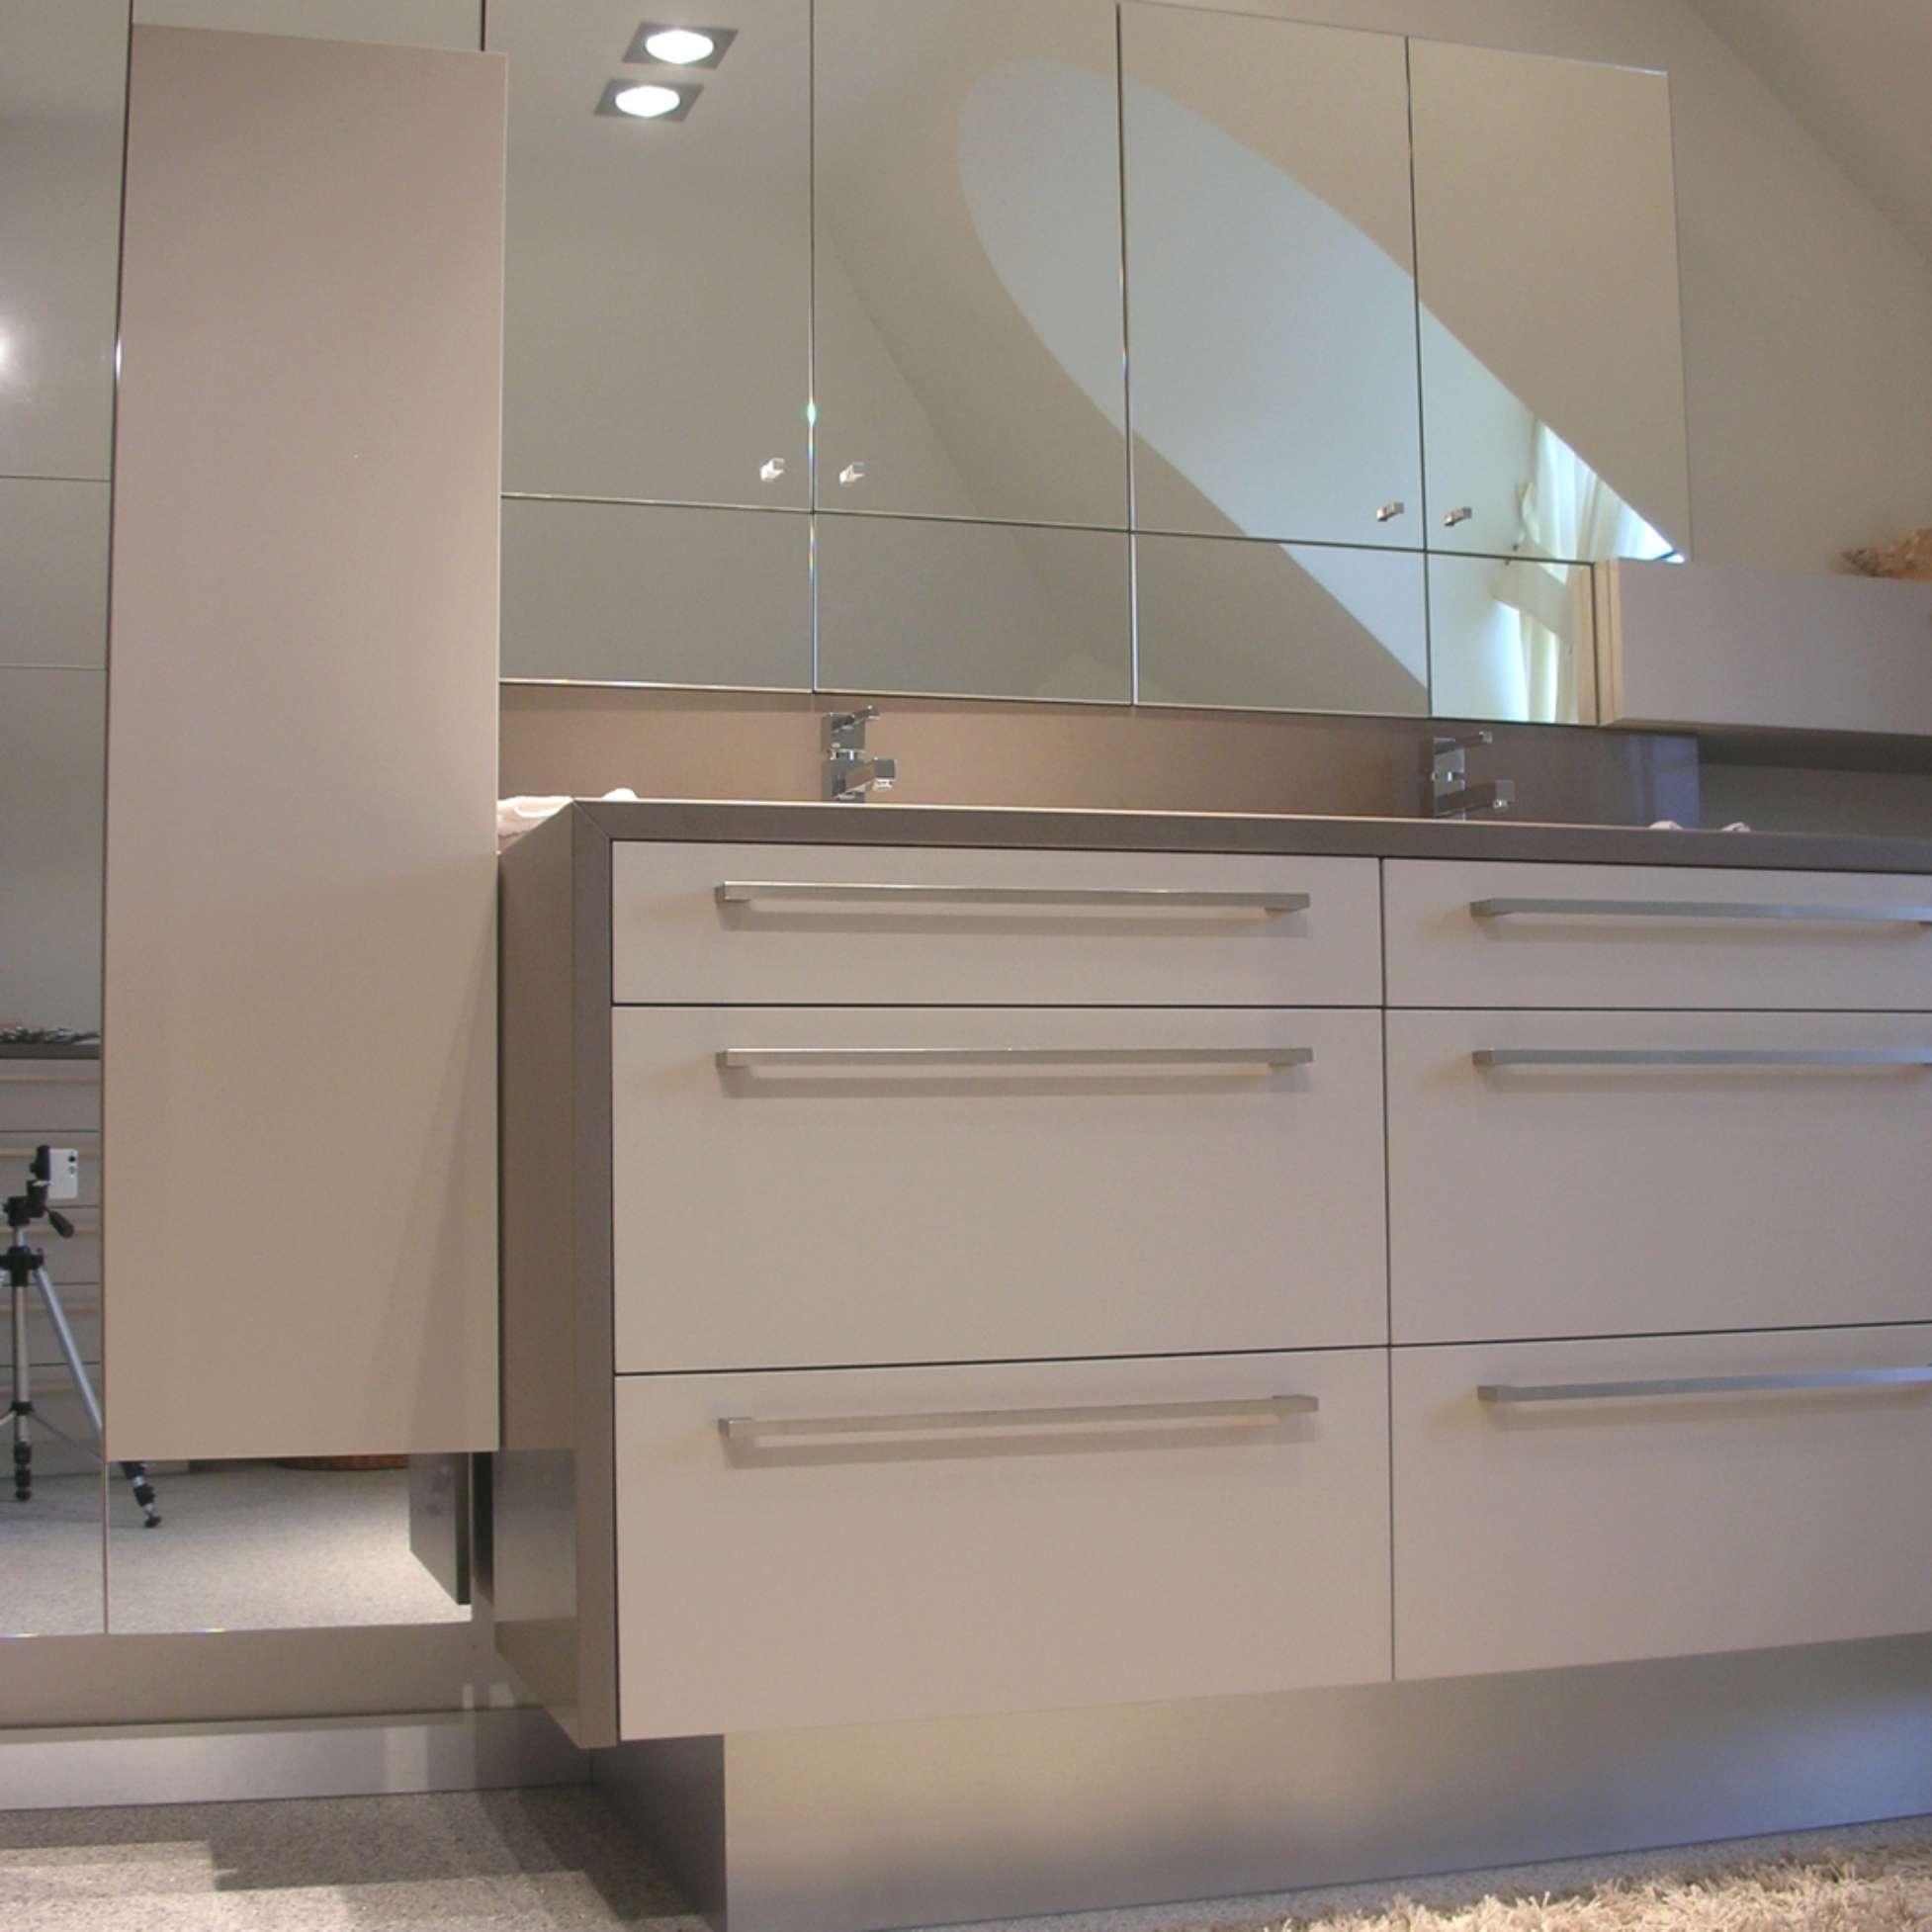 Moderne badkamer ontwerpen idee m interieurarchitecten in limburg - Badkamer in m ...